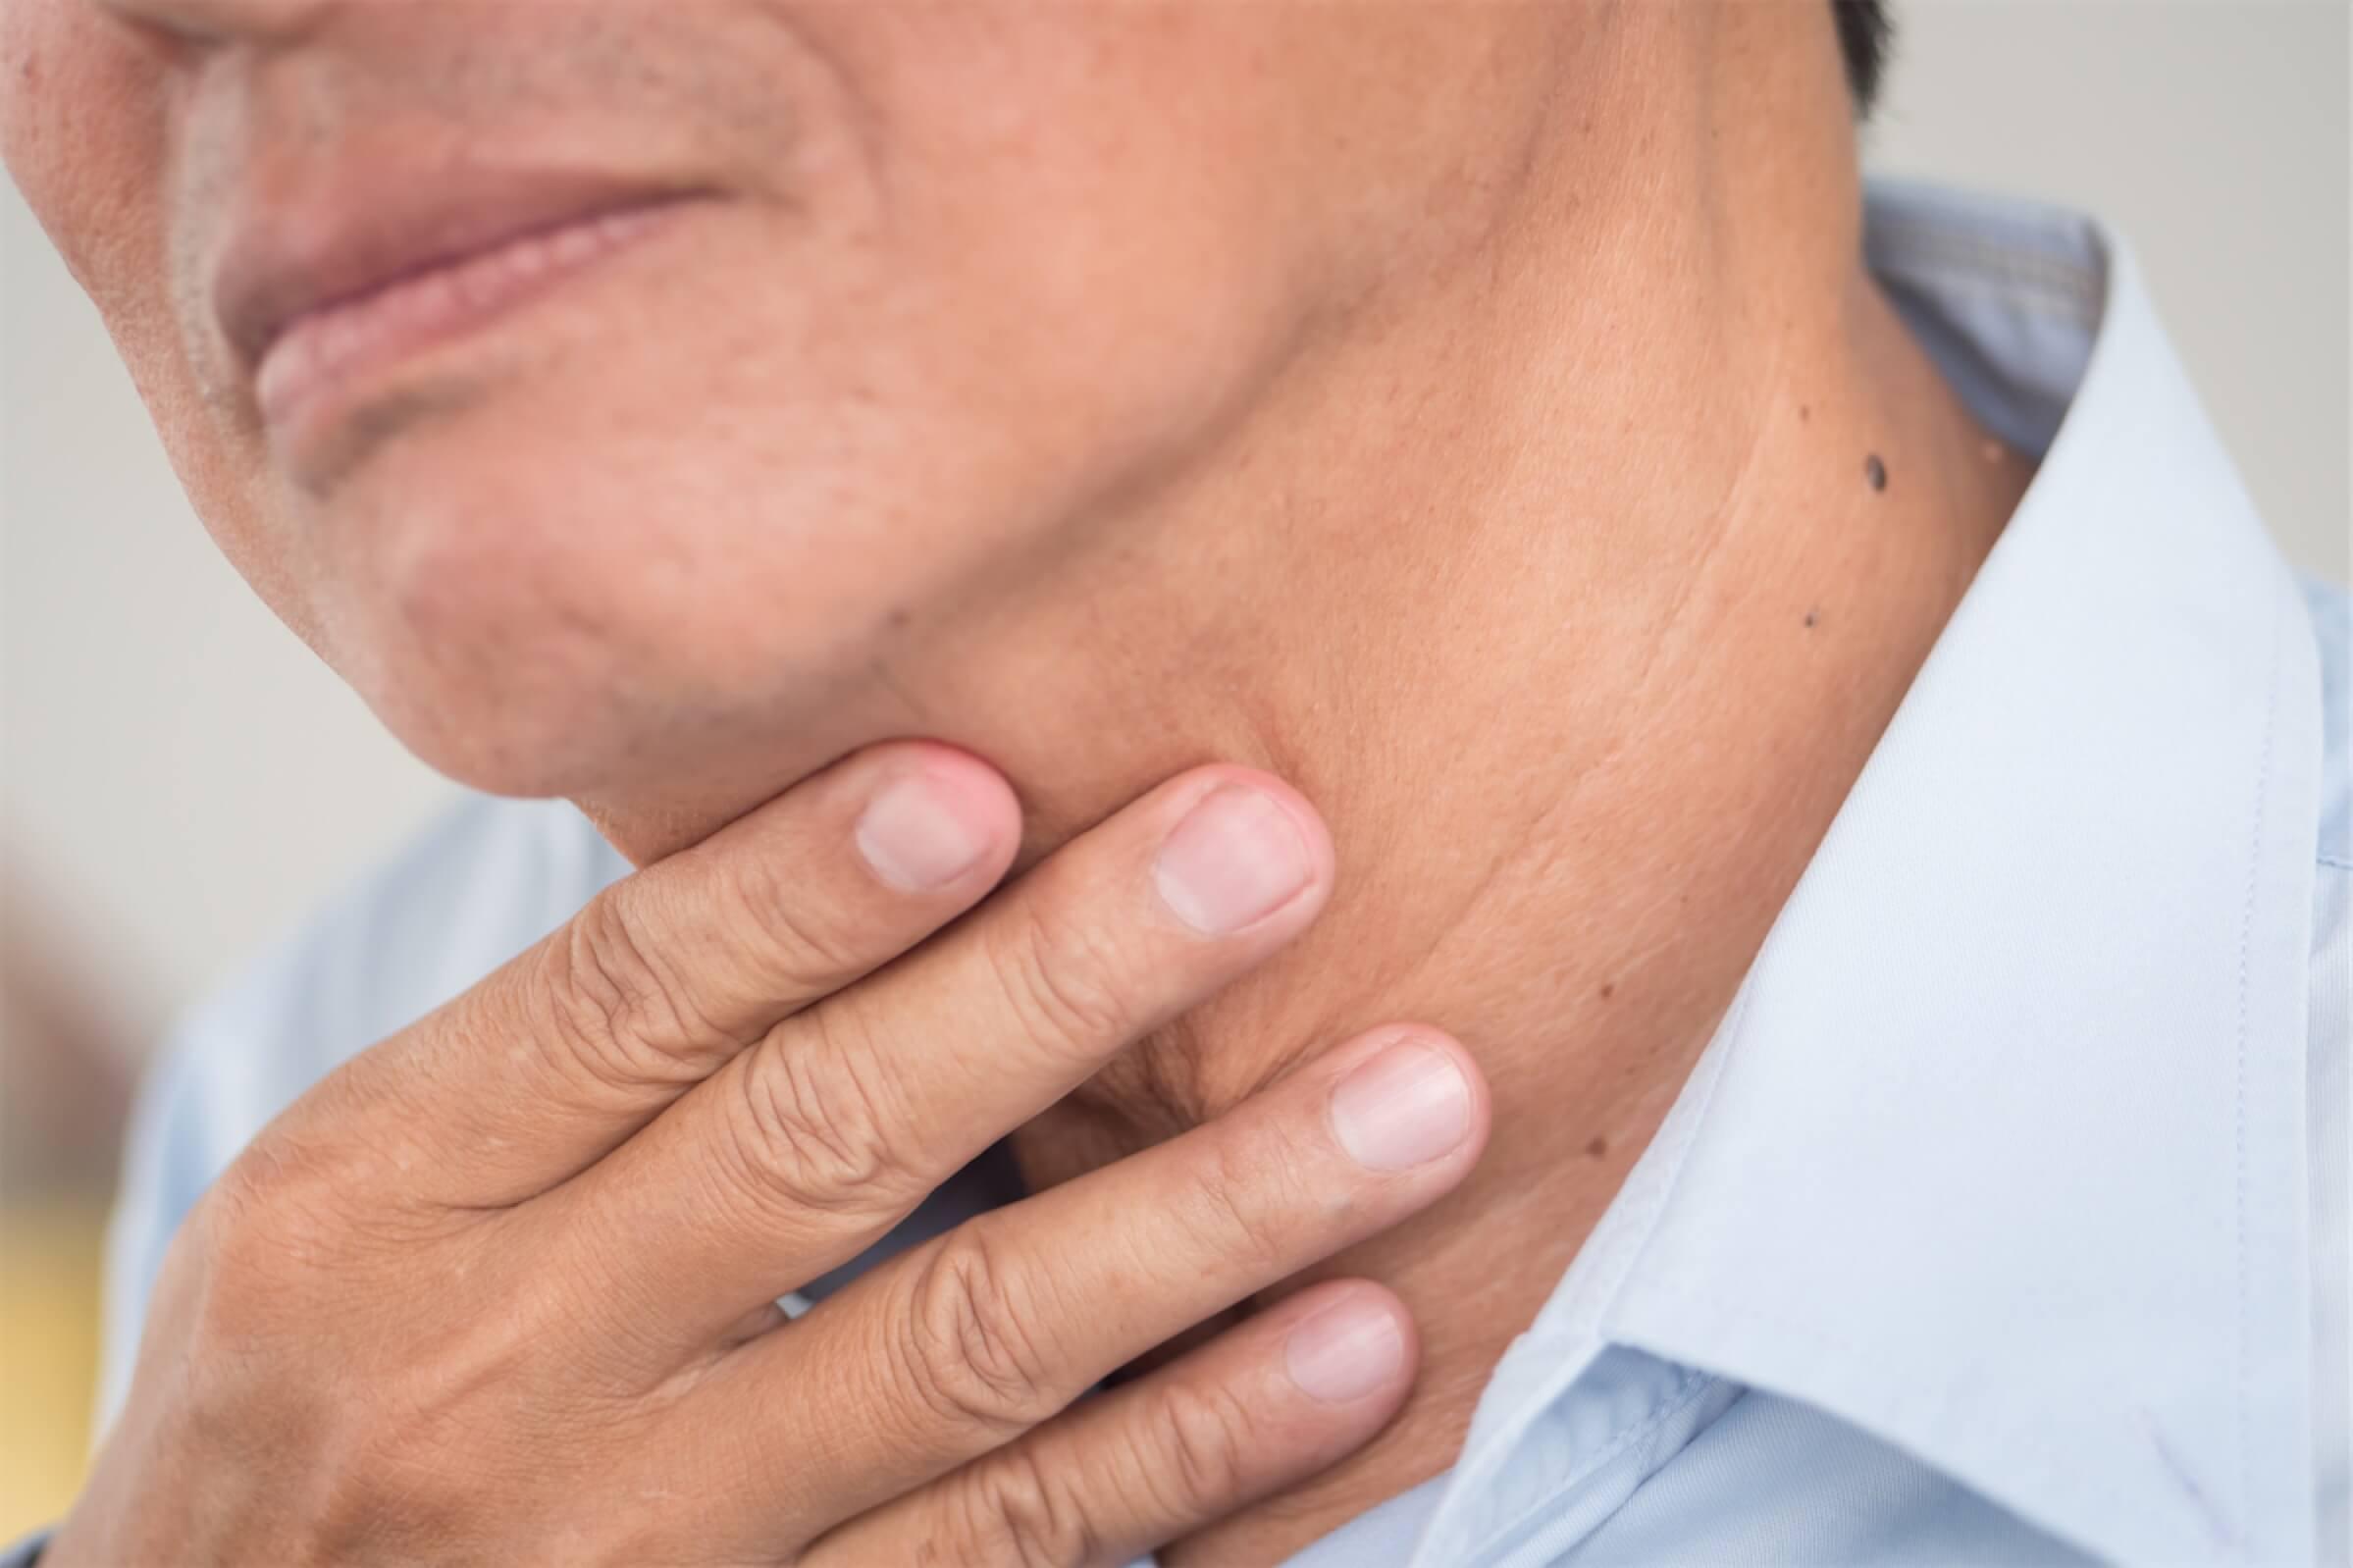 Laryngitis home remedies: 7 things that might help